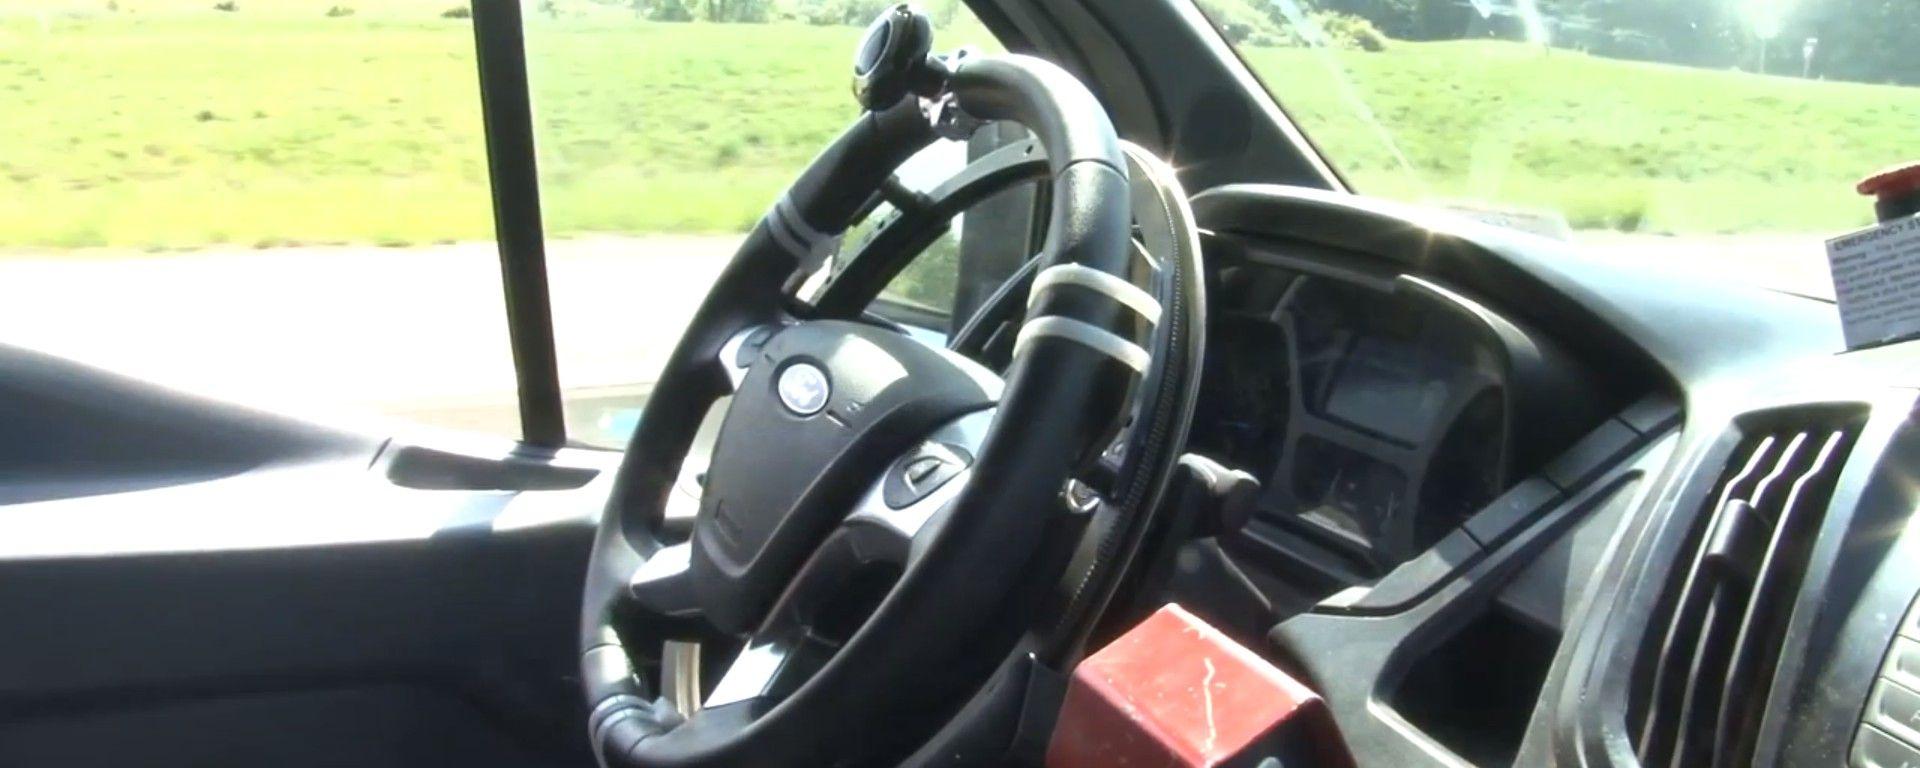 Ford Transit: test di durata coi robot